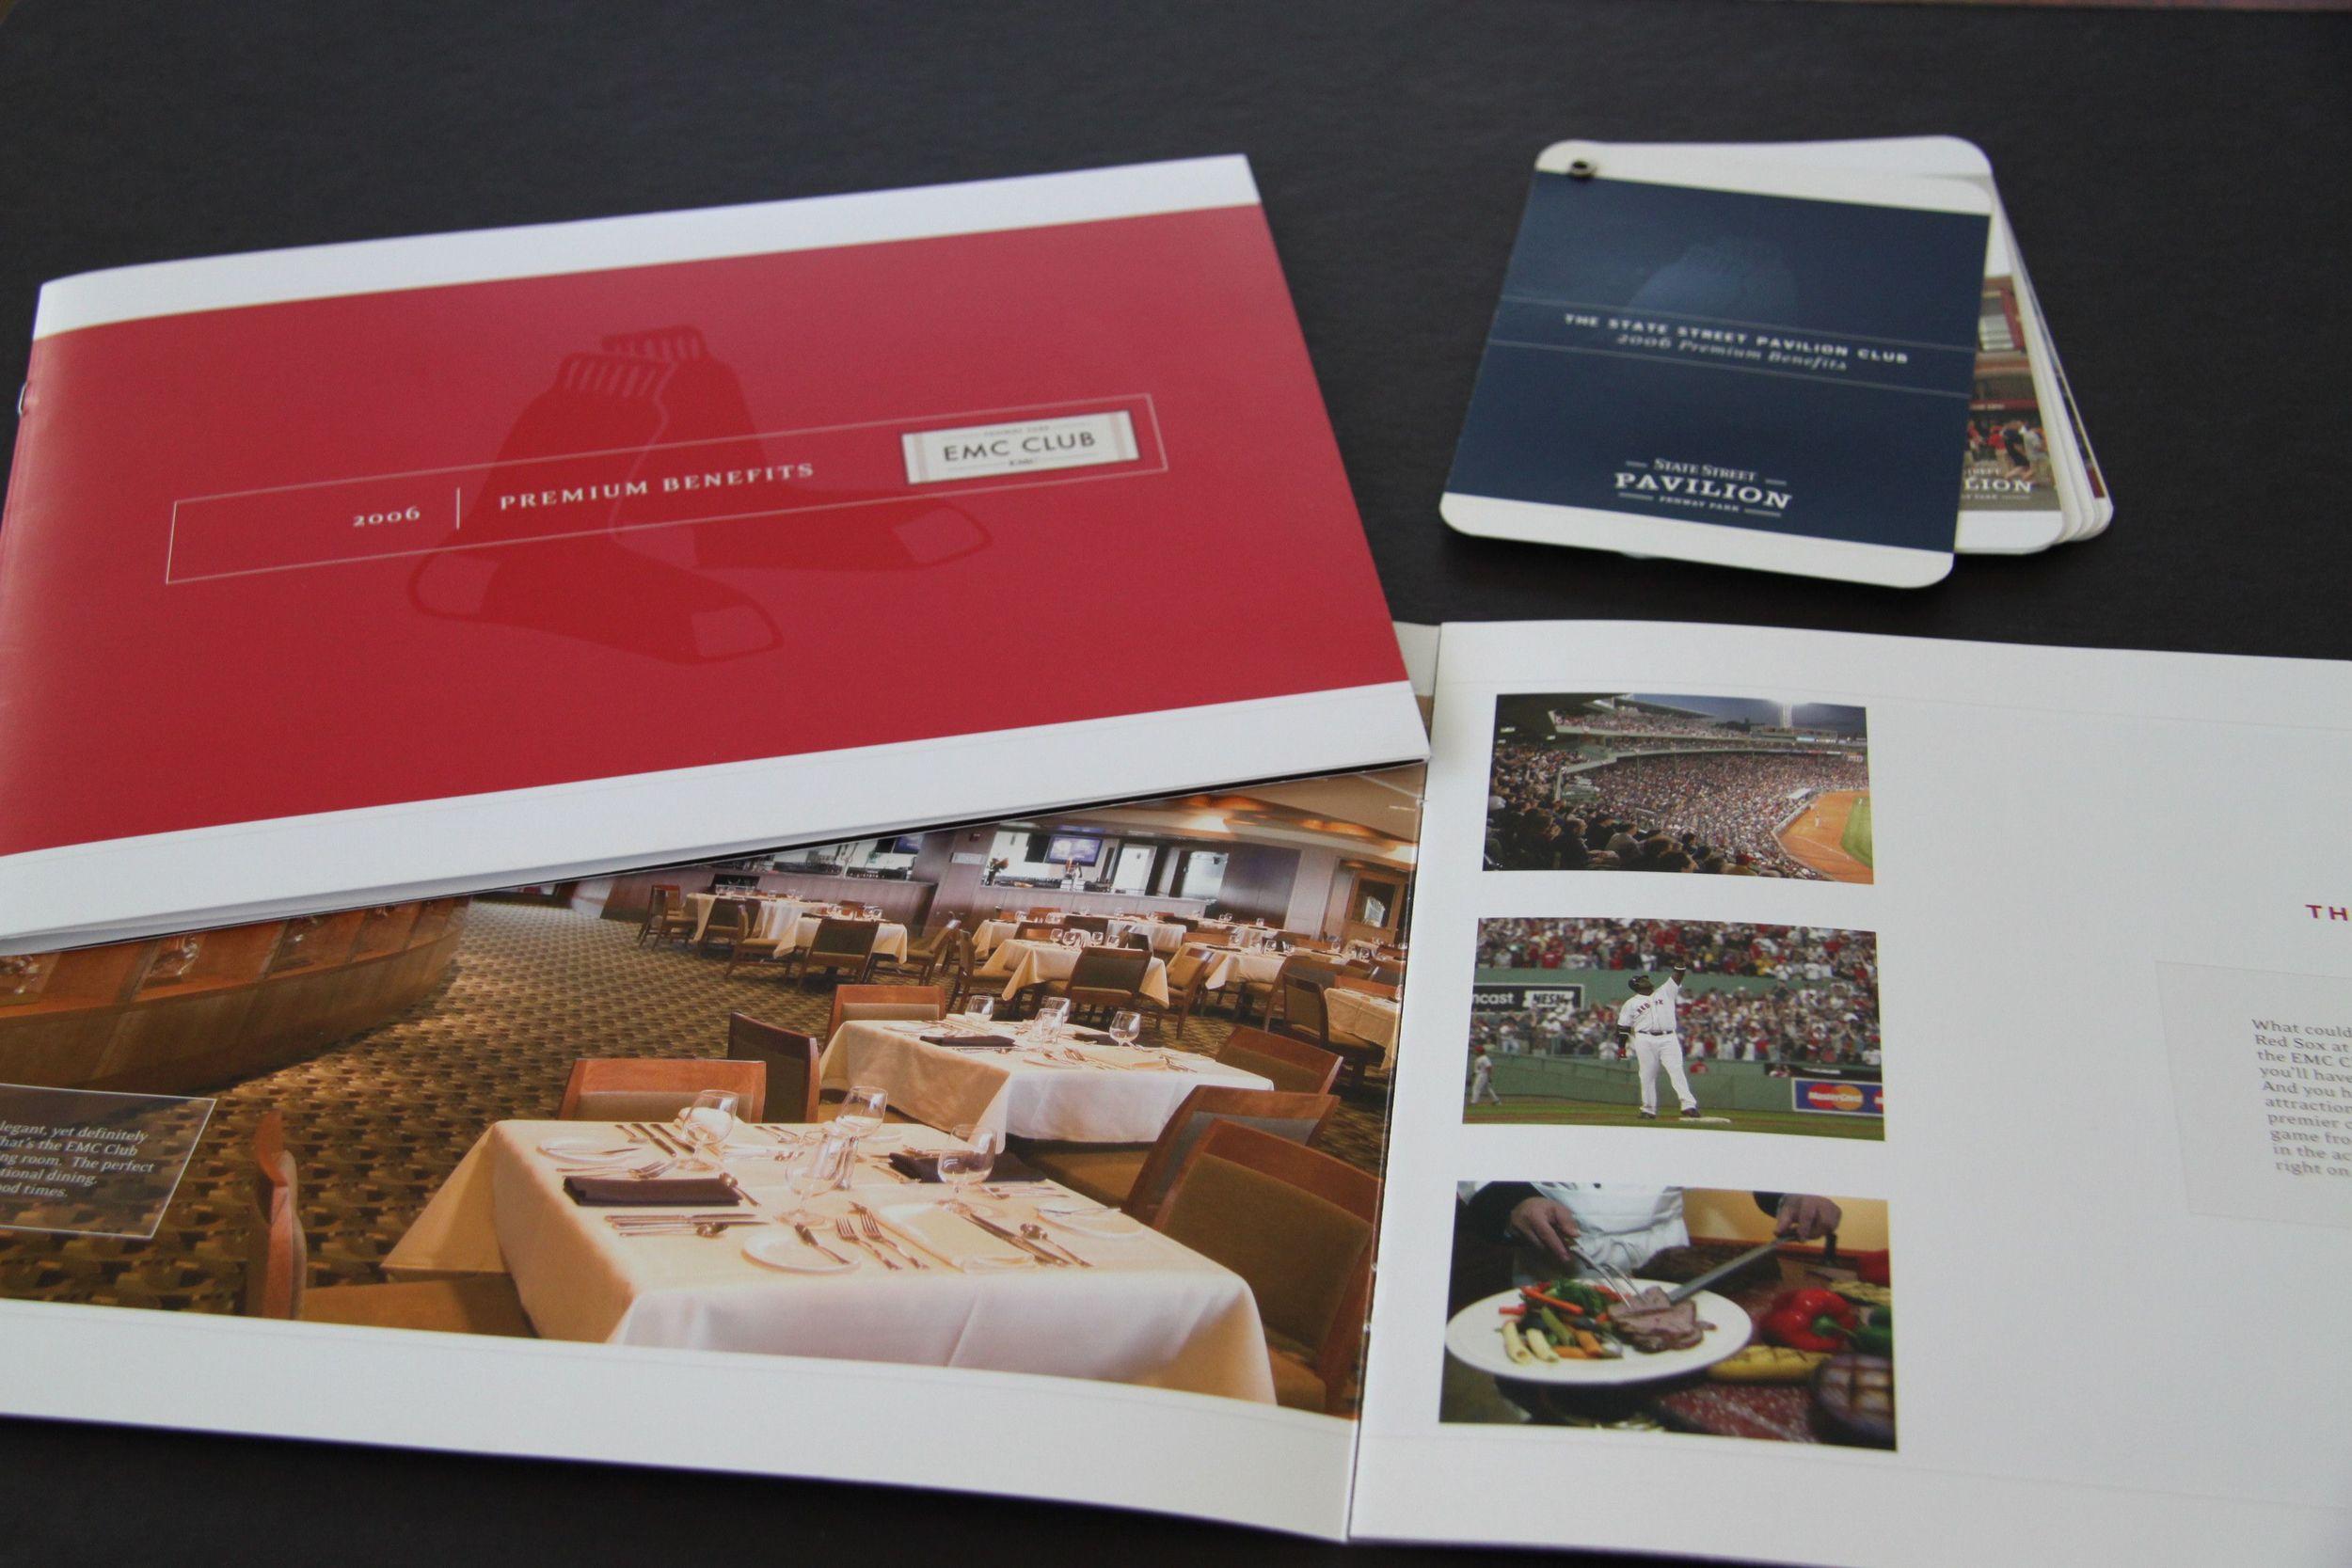 Boston Red Sox EMC Club and Pavillion Club Level Benefits Brochures